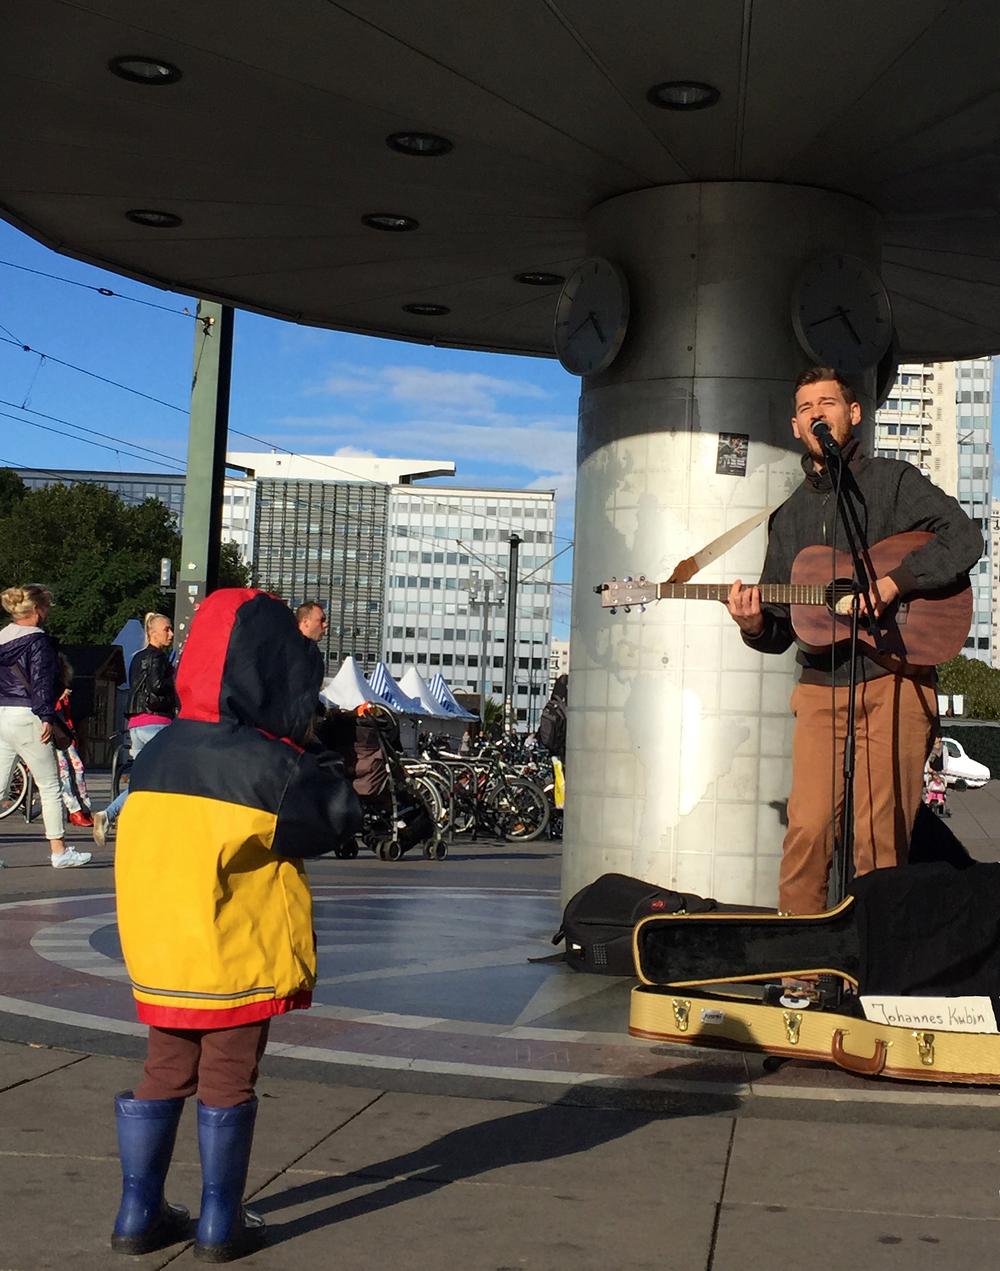 Johannes Kubin am Alexanderplatz + Kind.jpg